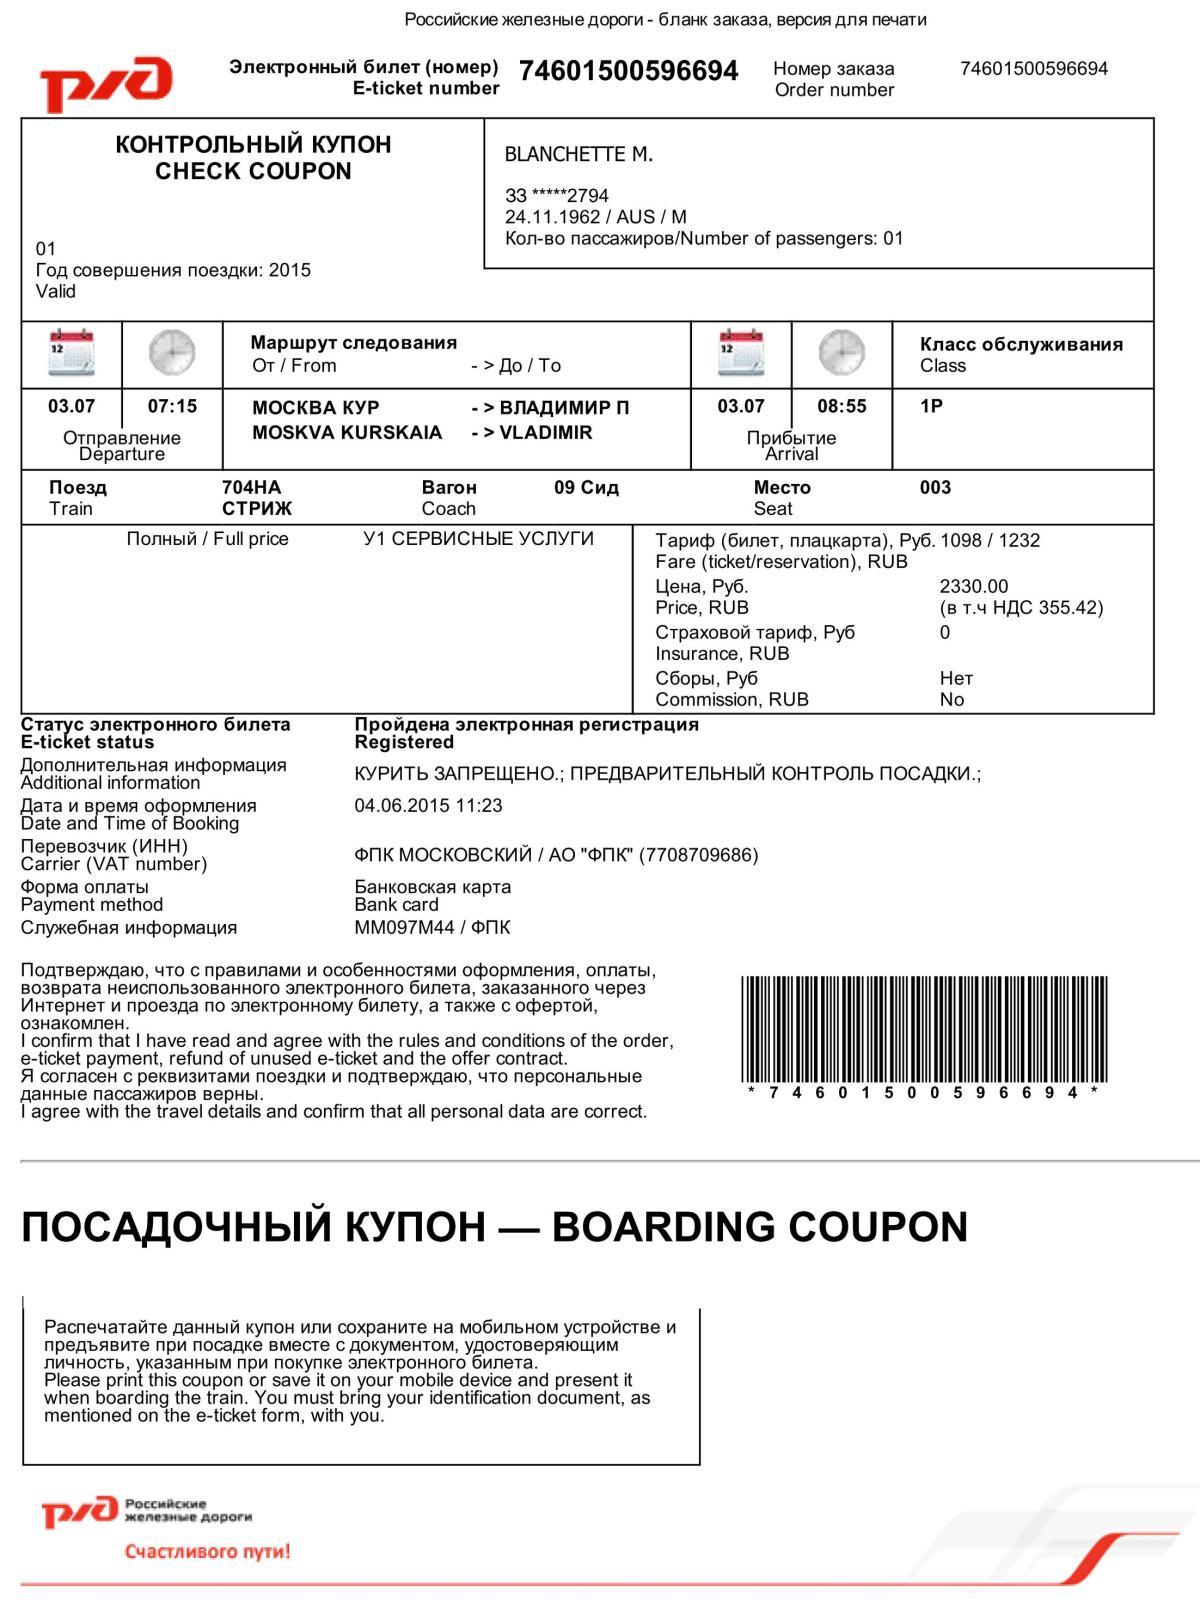 Krasnodar - Moscow: distance, cost of train tickets